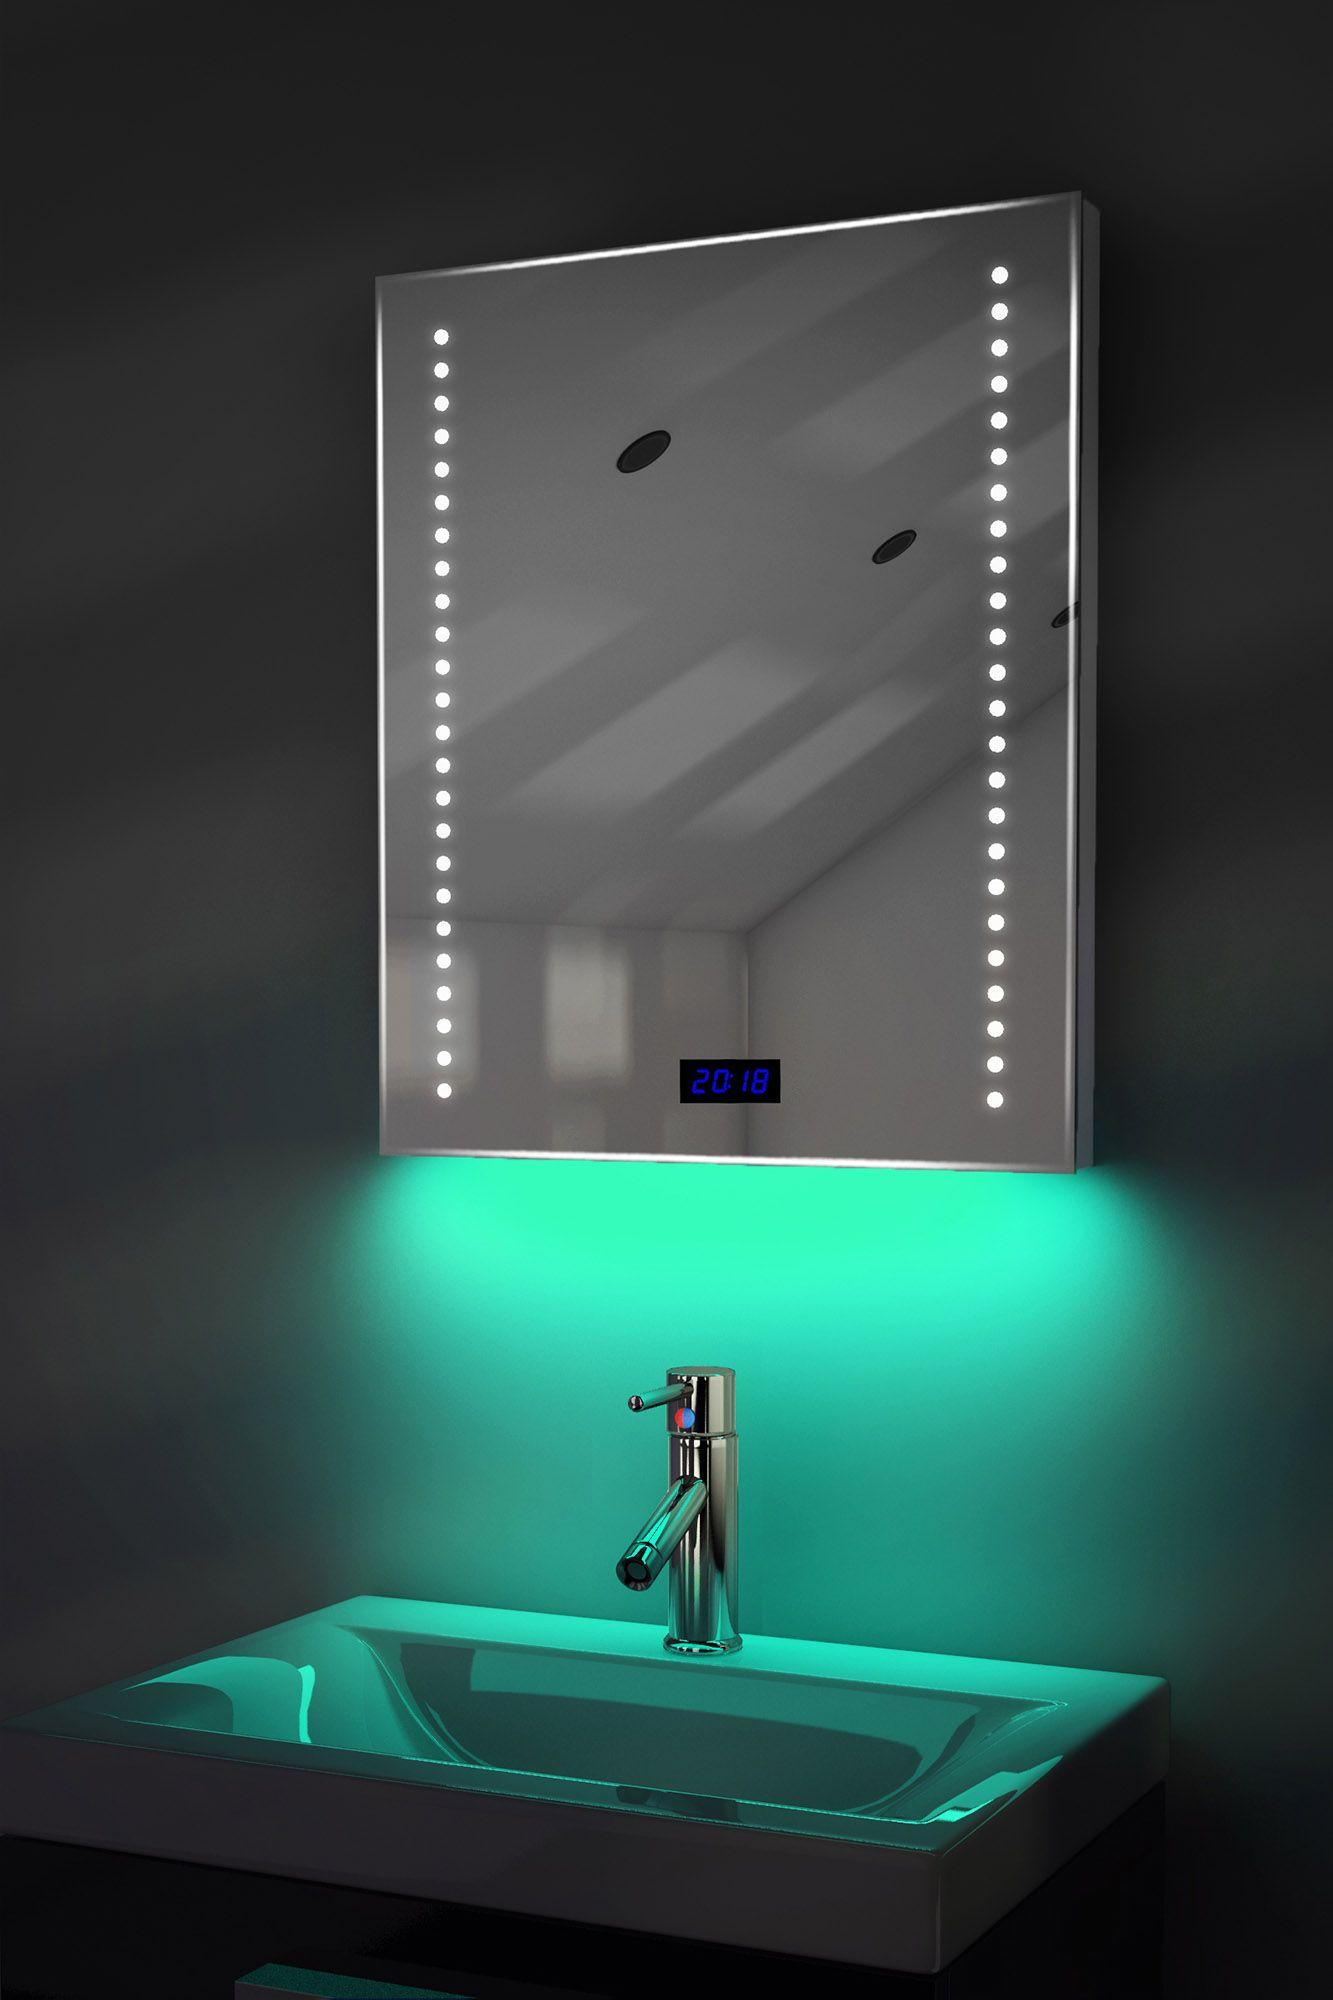 Digital Clock Shaver Bathroom Mirror With Under Lighting Demist Sensor K191t Bathroom Clock Bathroom Design Luxury Luxury Bathroom Faucets